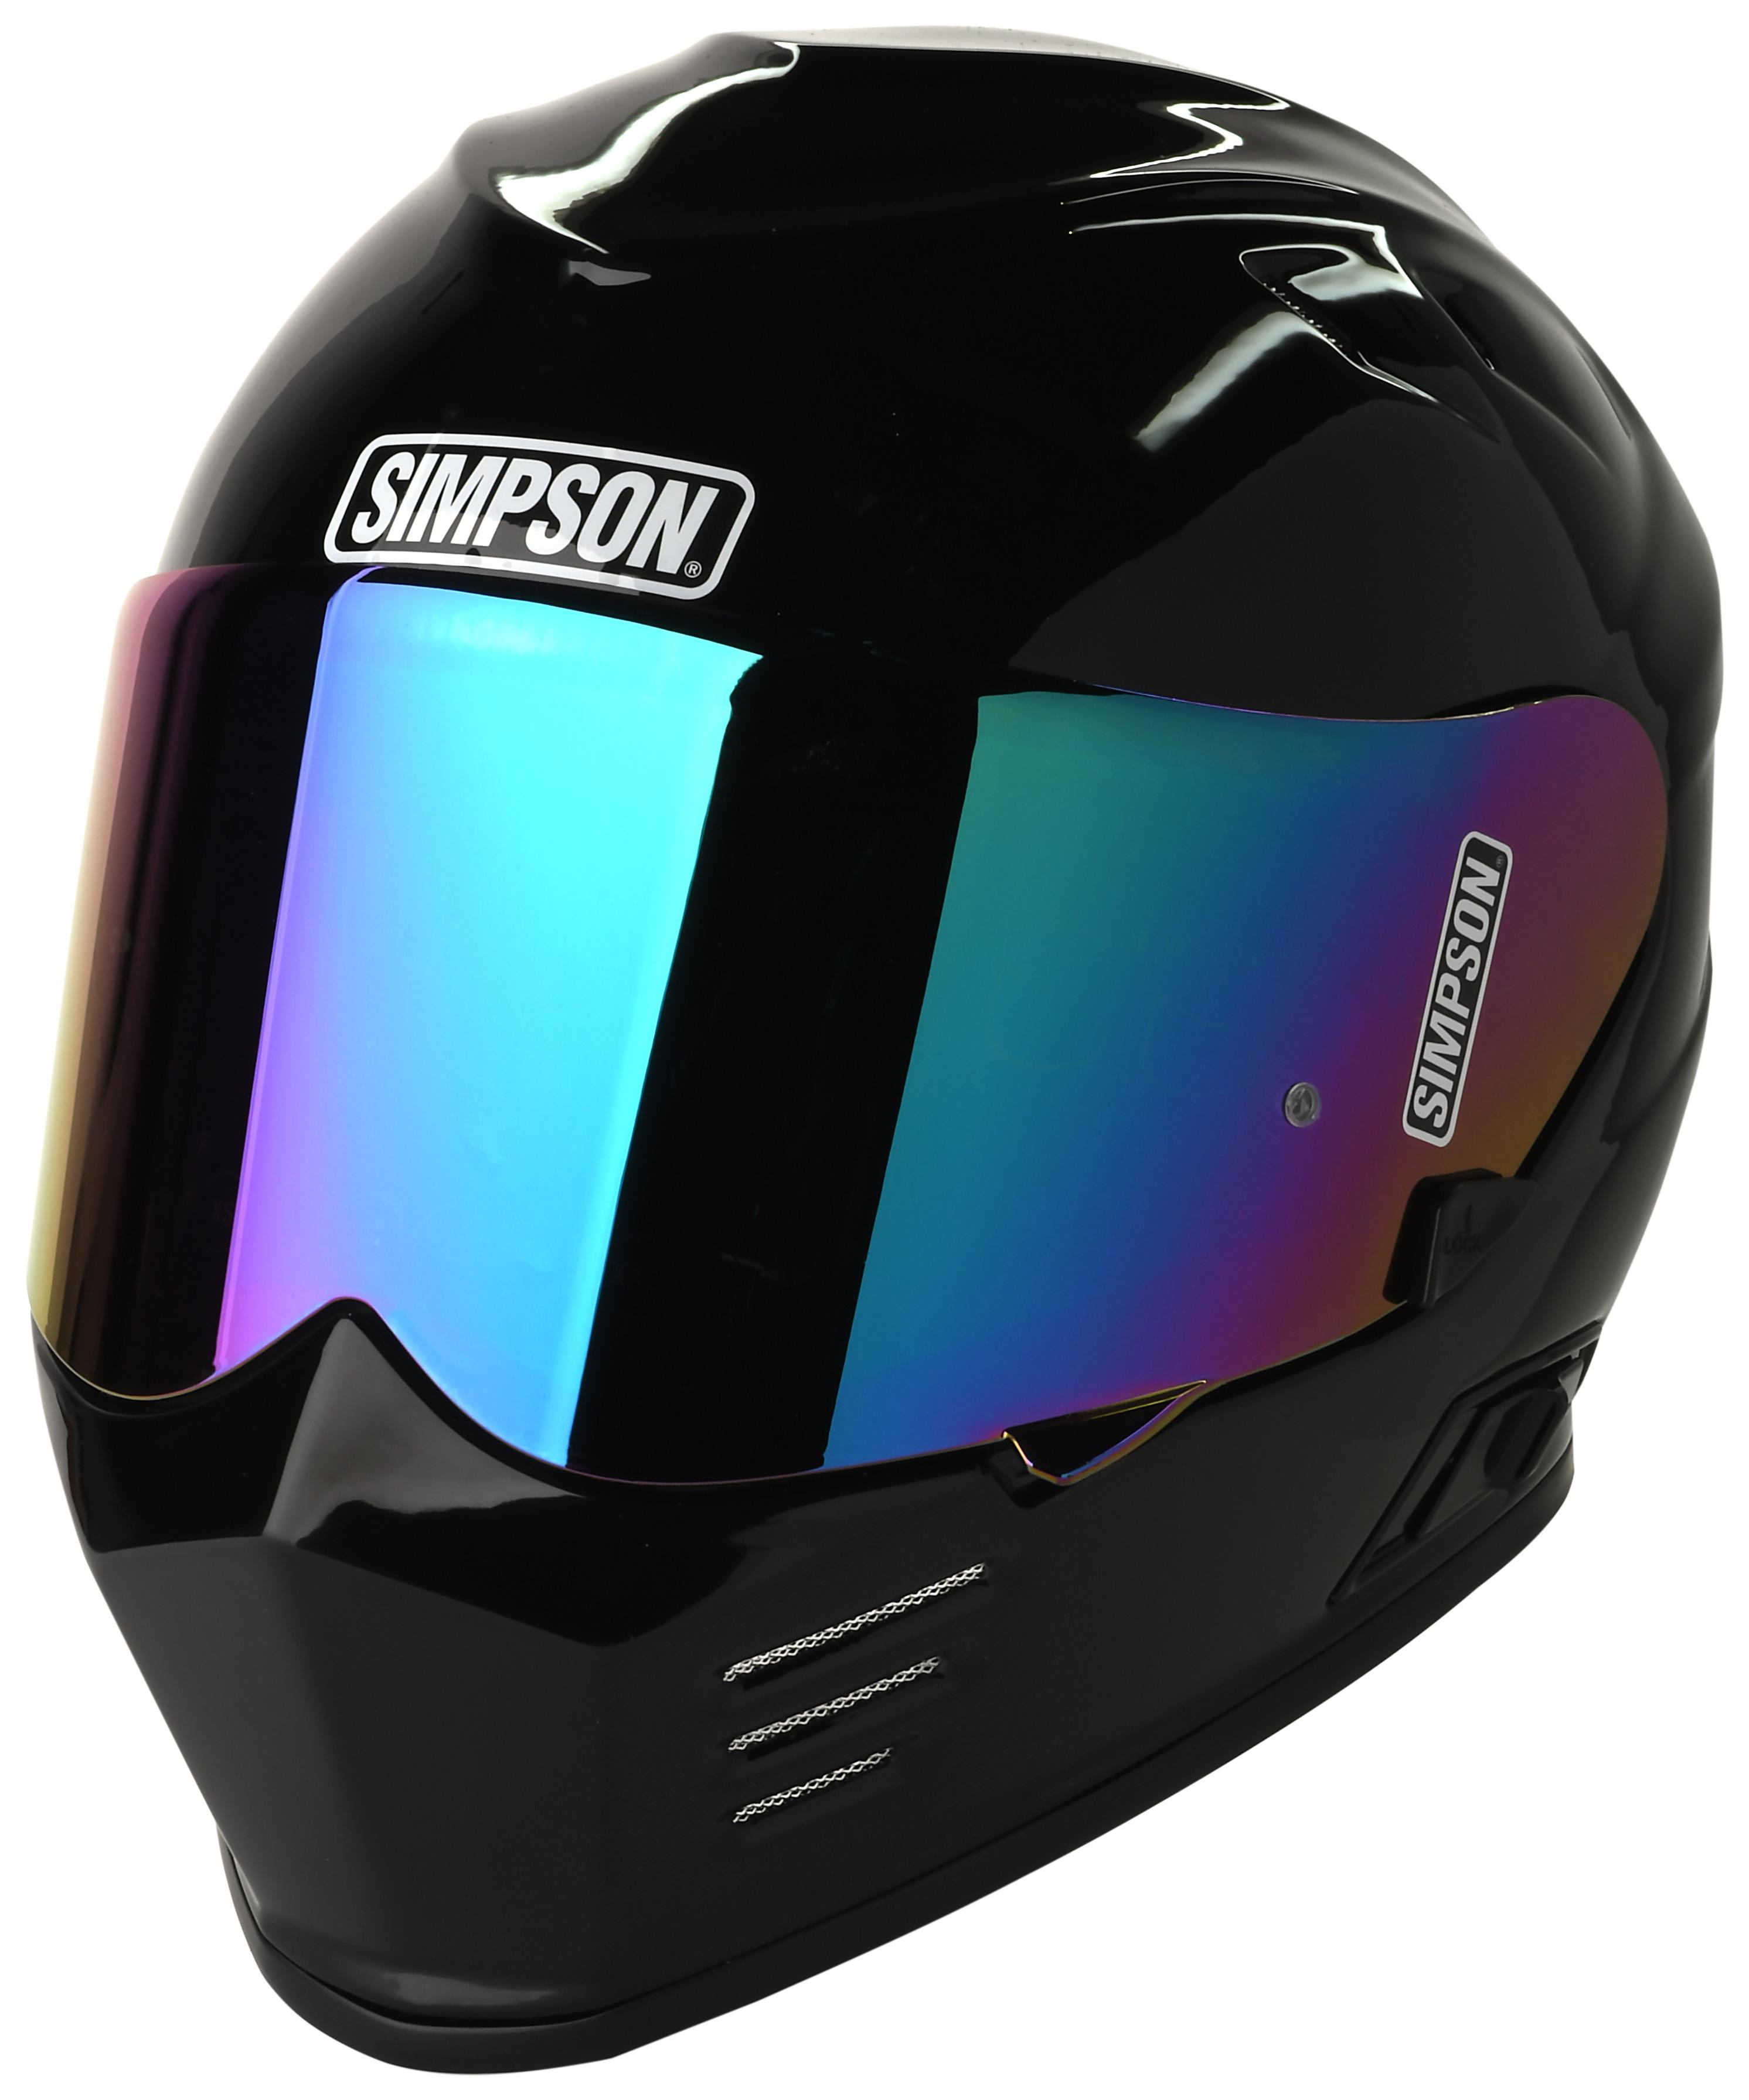 51e237fc Simpson Ghost Bandit Helmet - Cycle Gear